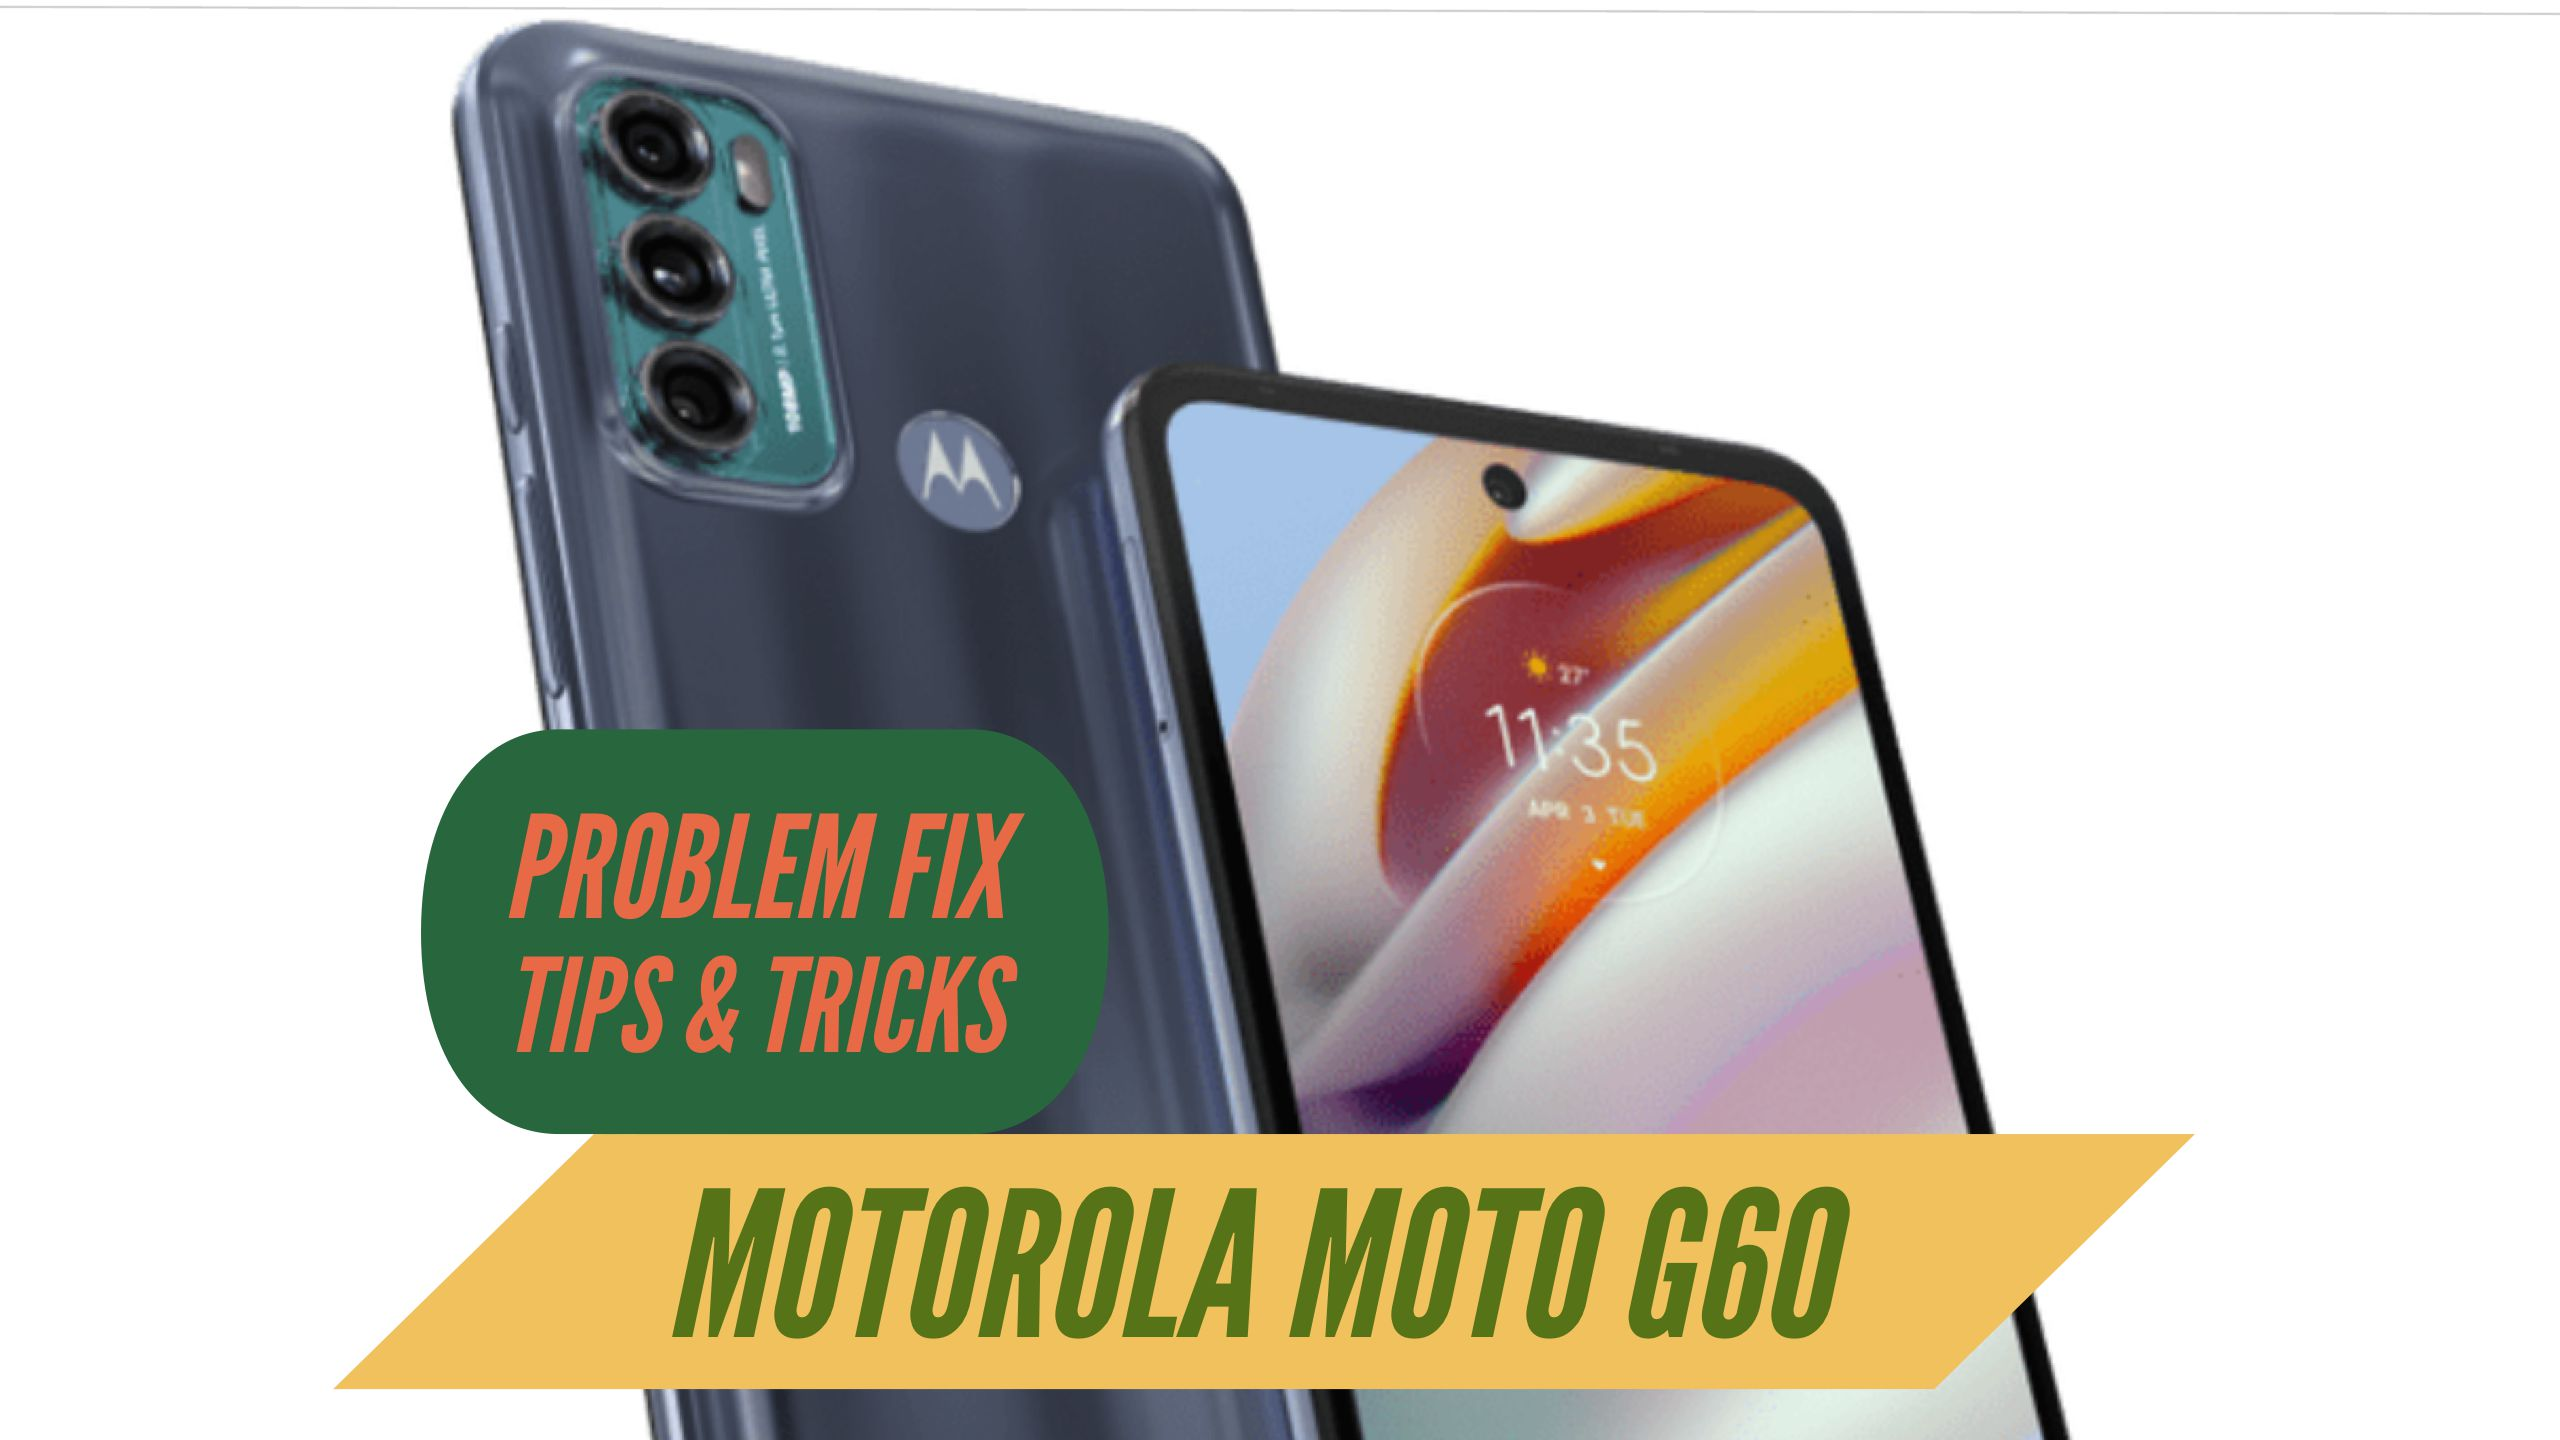 Motorola Moto G60 Problem Fix Issues Solution TIPS & TRICKS